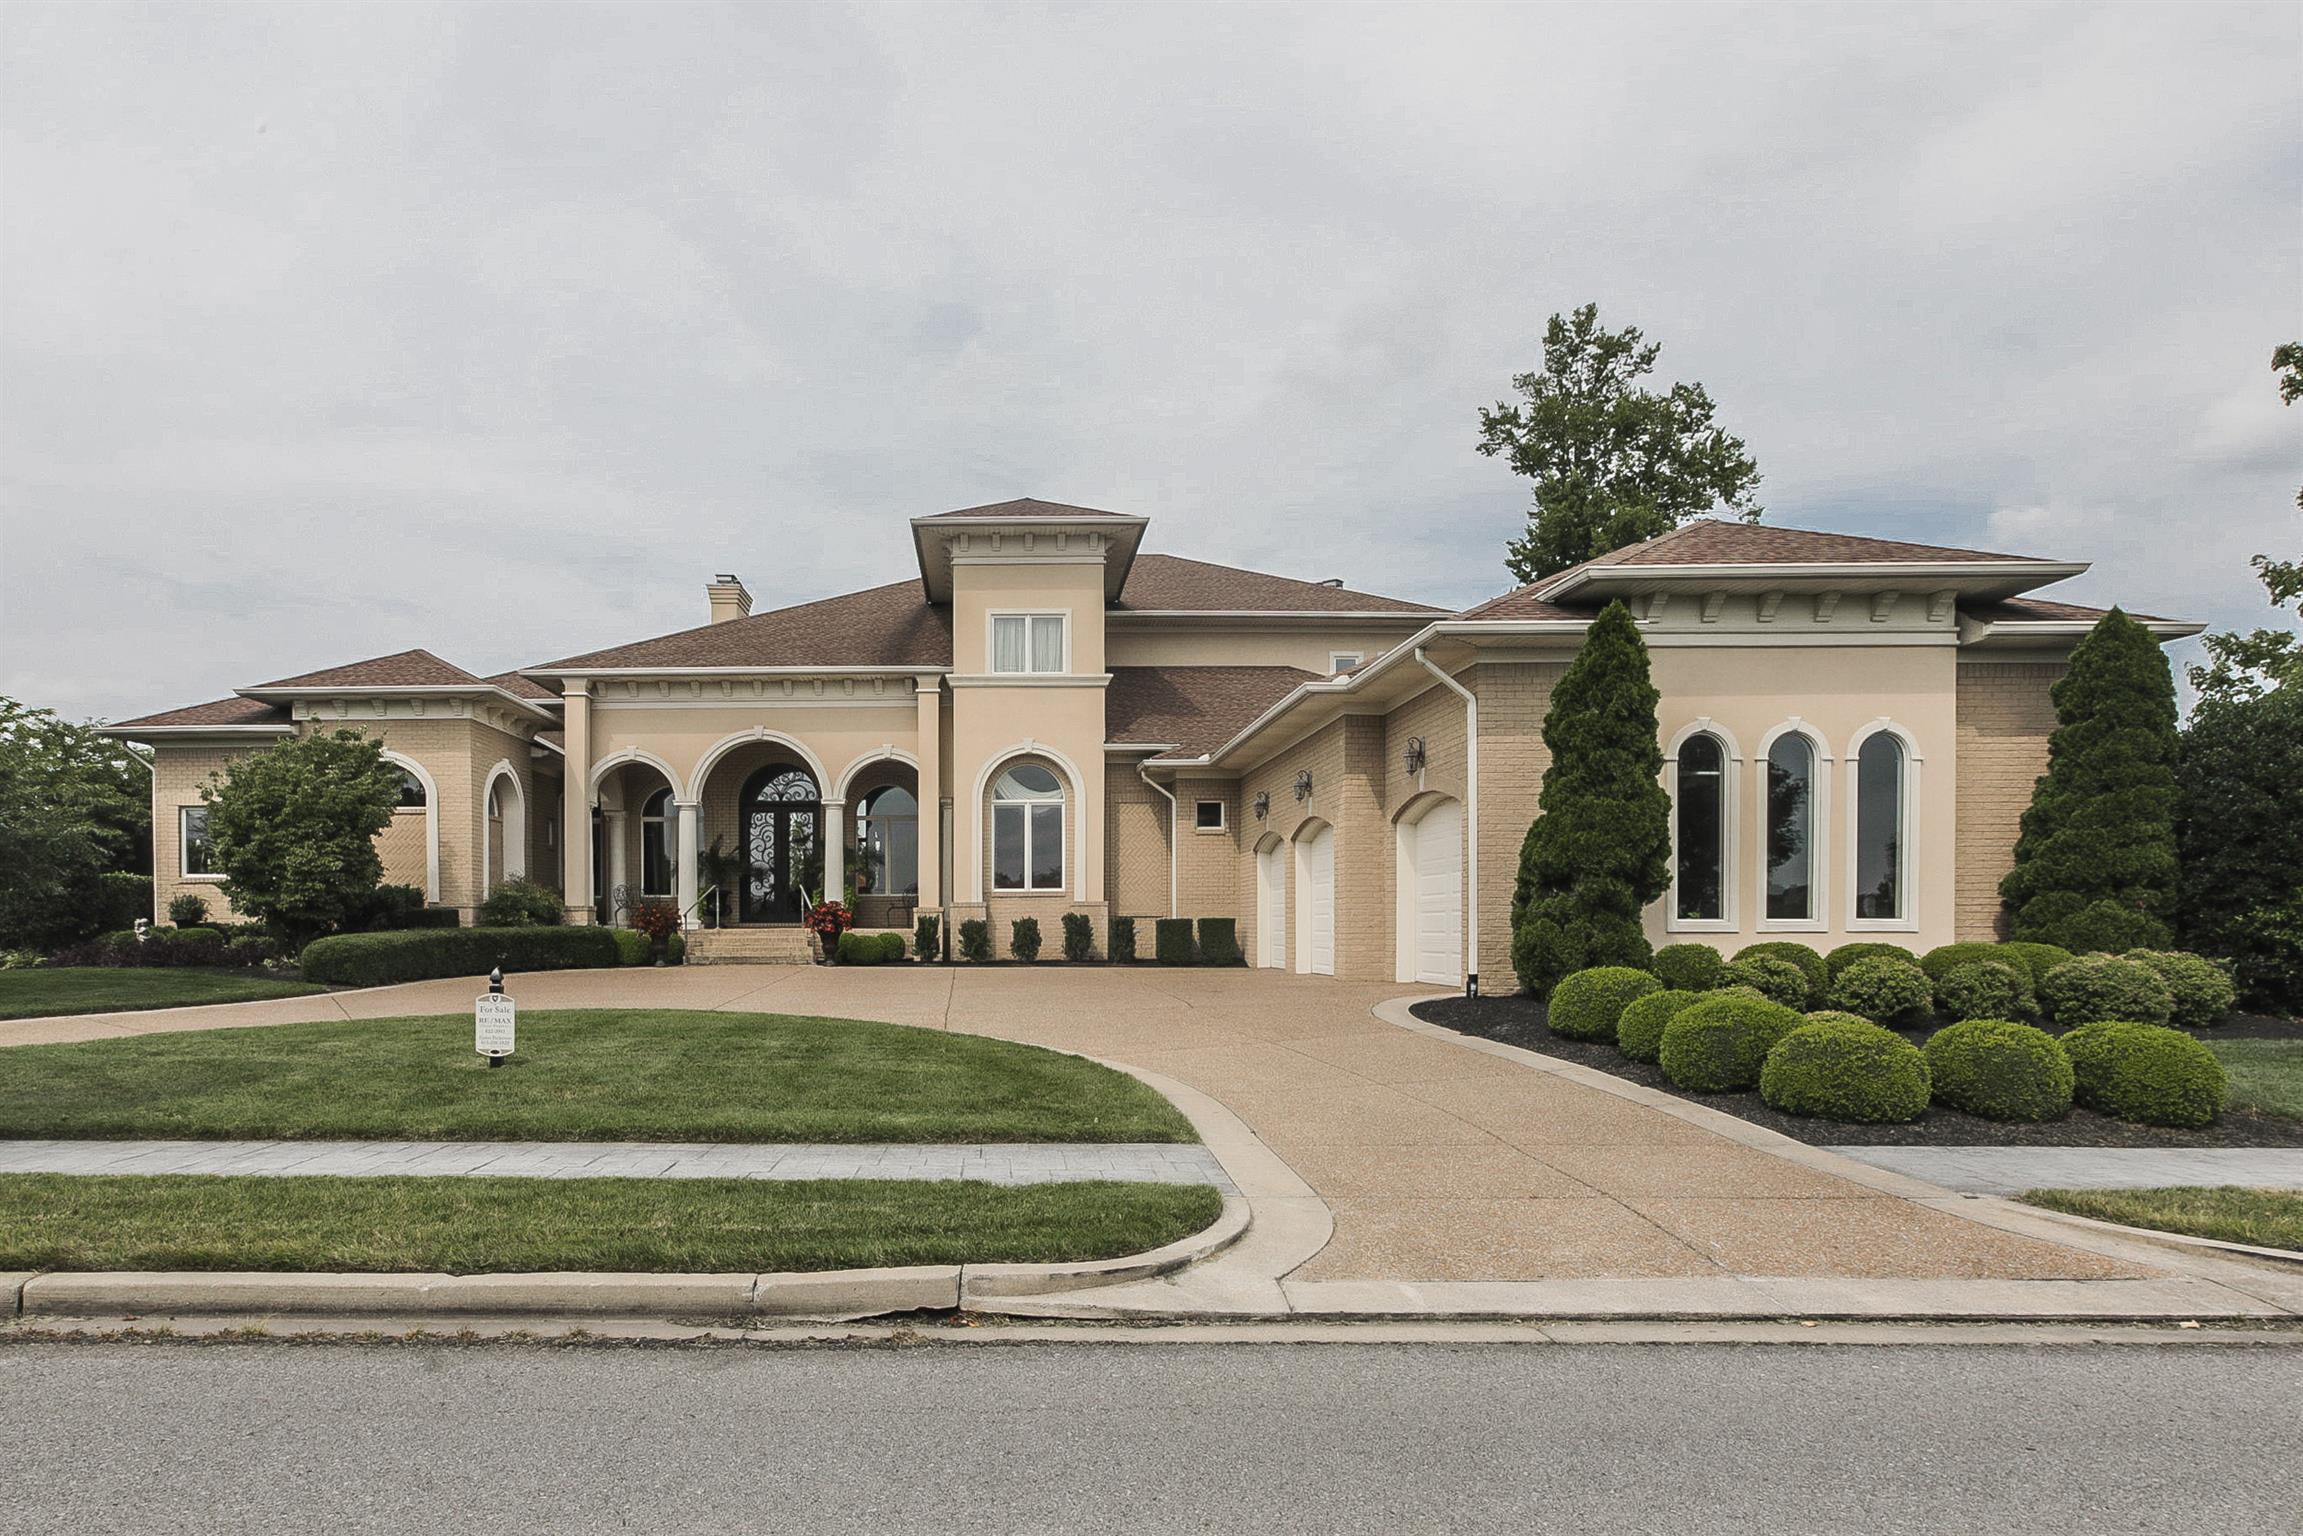 1110 Plantation Blvd, Gallatin, TN 37066 - Gallatin, TN real estate listing